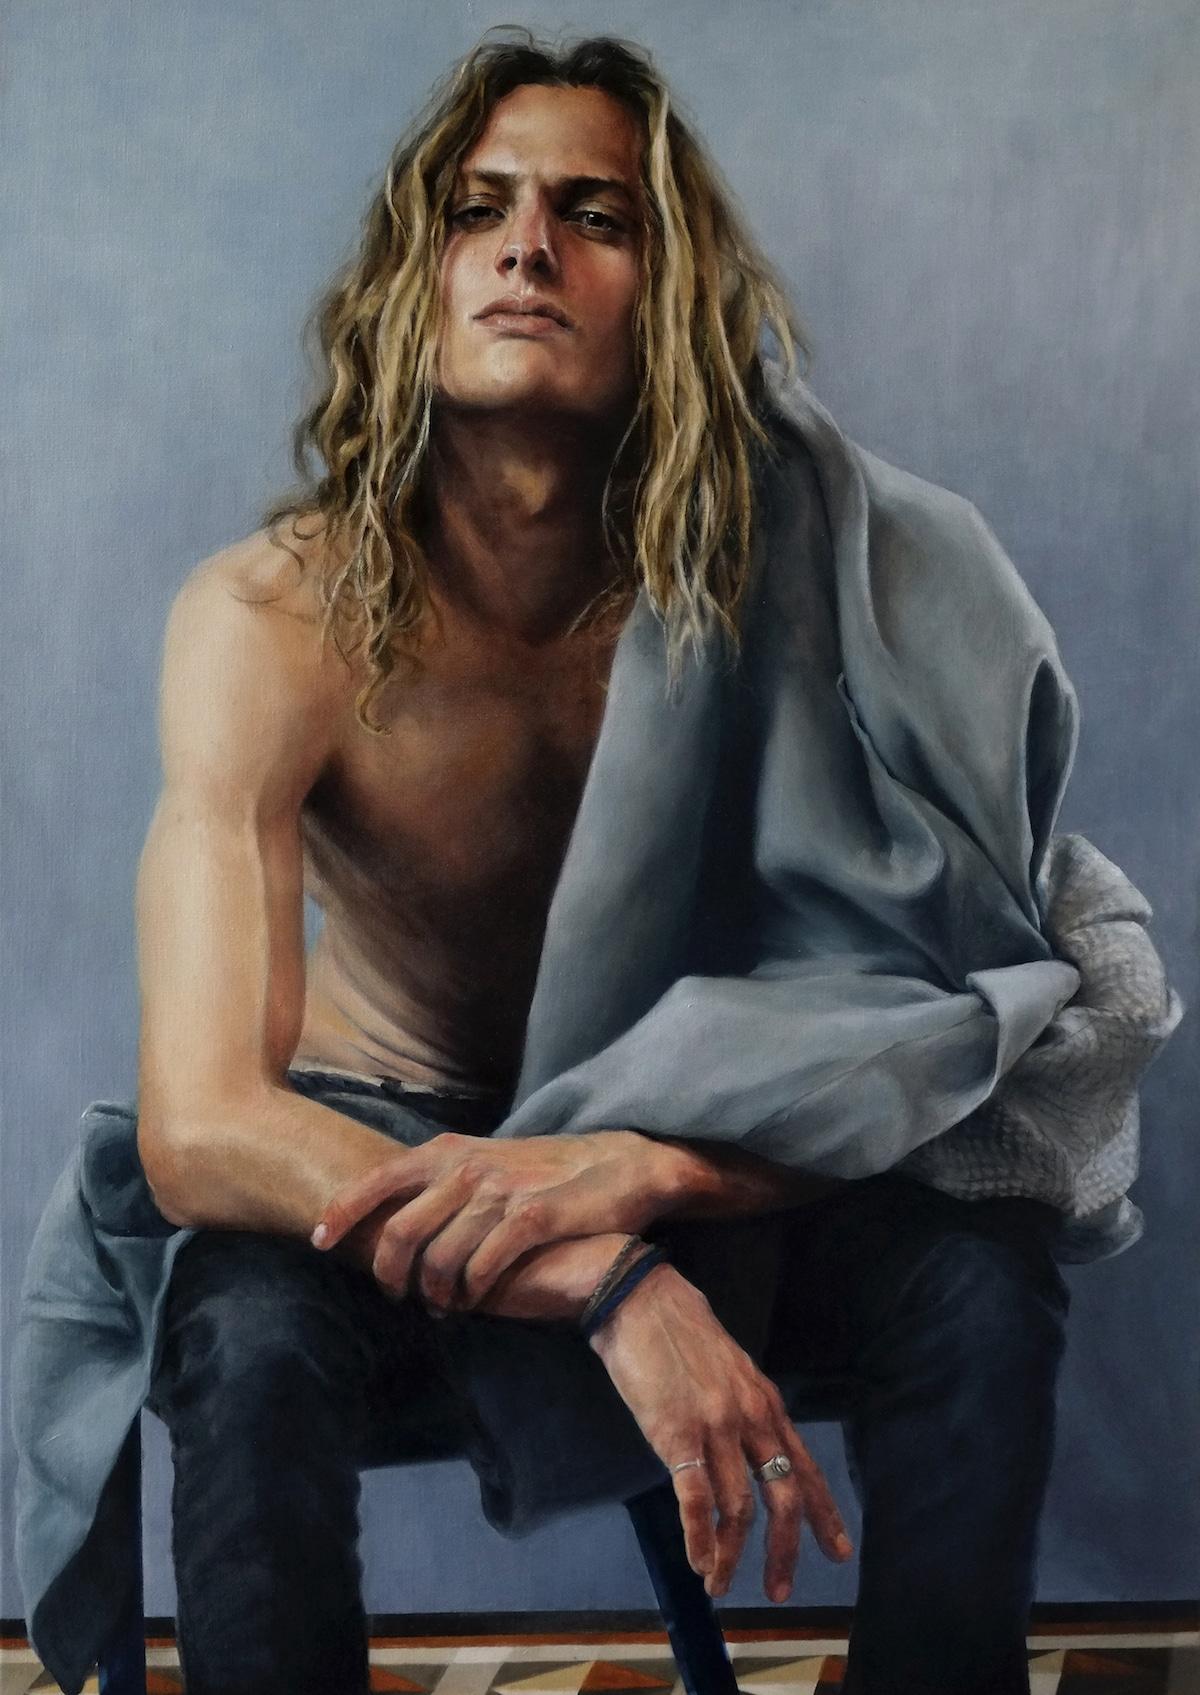 Male Portraiture by Alessandro Tomassetti